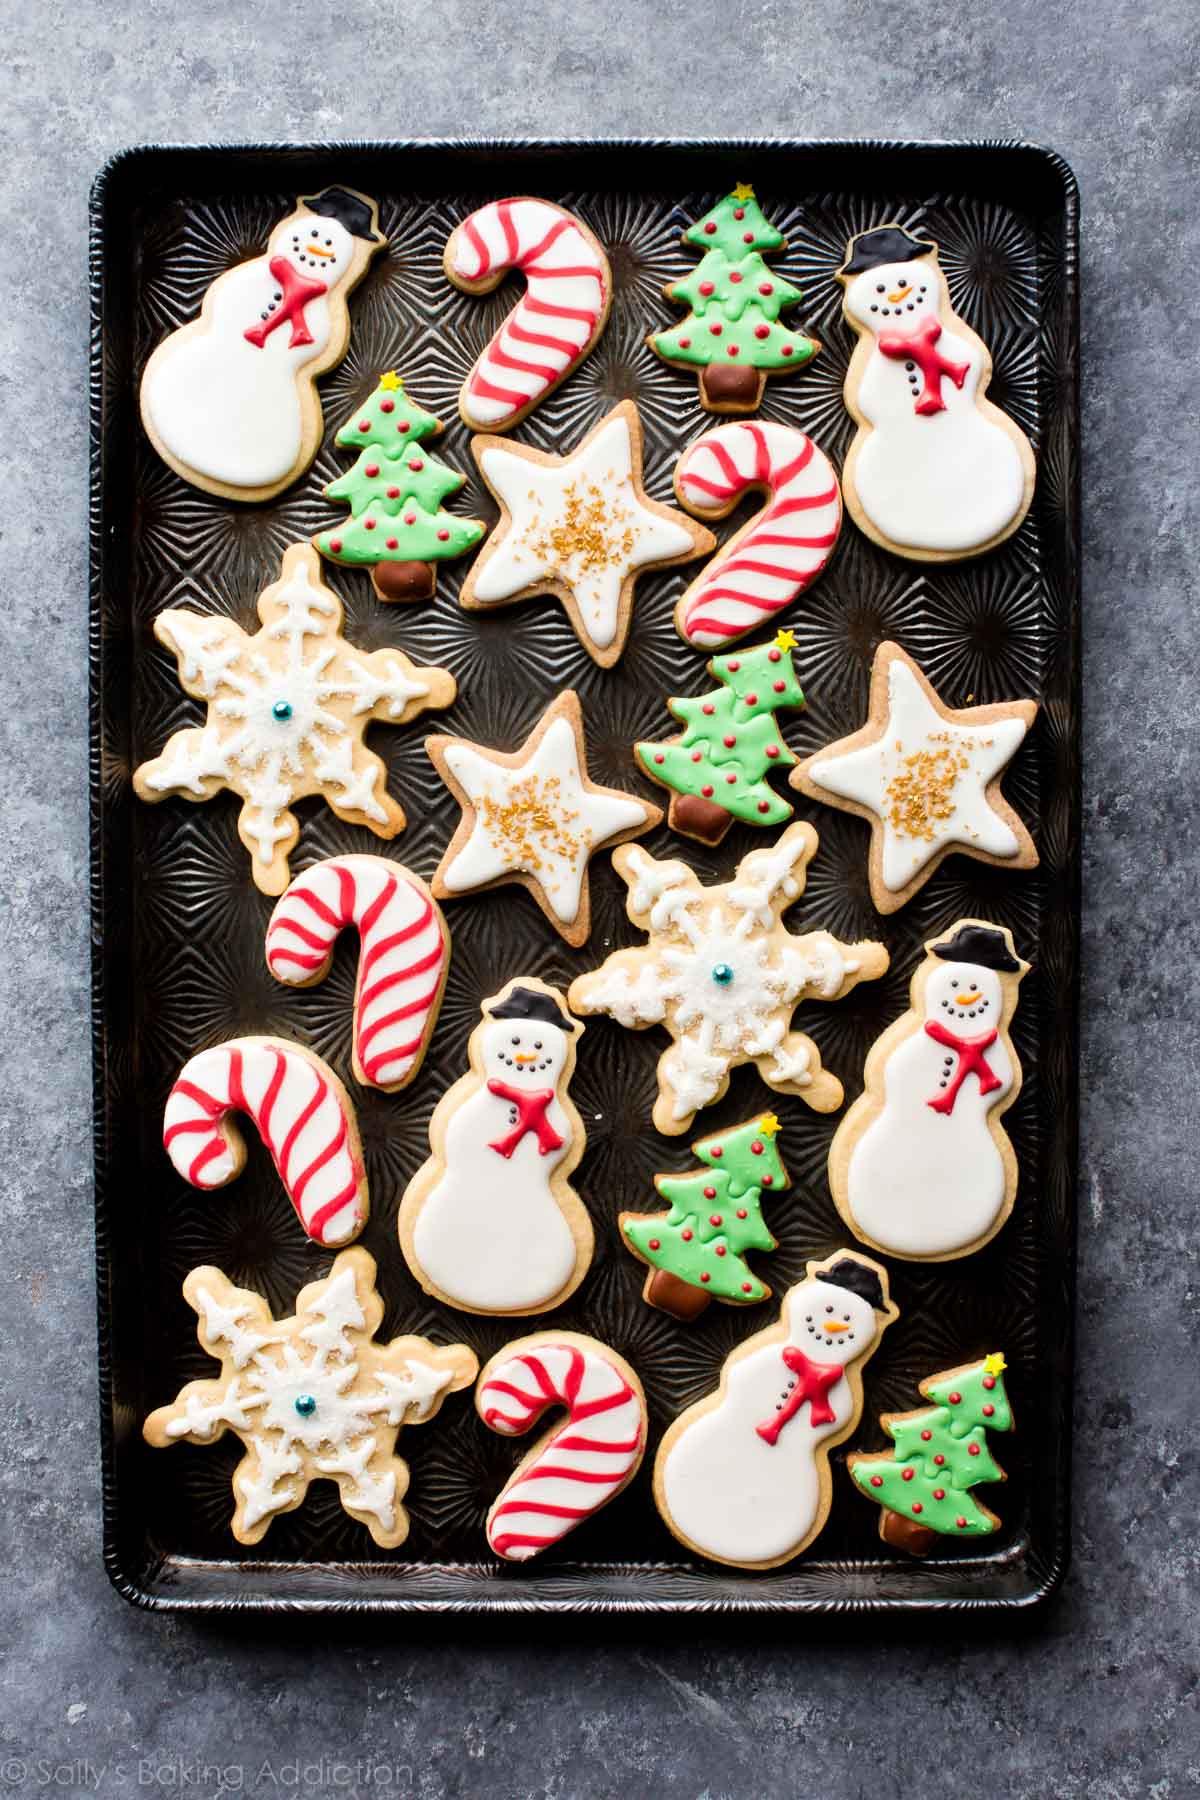 Decorated Sugar Cookies  1 Sugar Cookie Dough 5 Ways to Decorate Sallys Baking